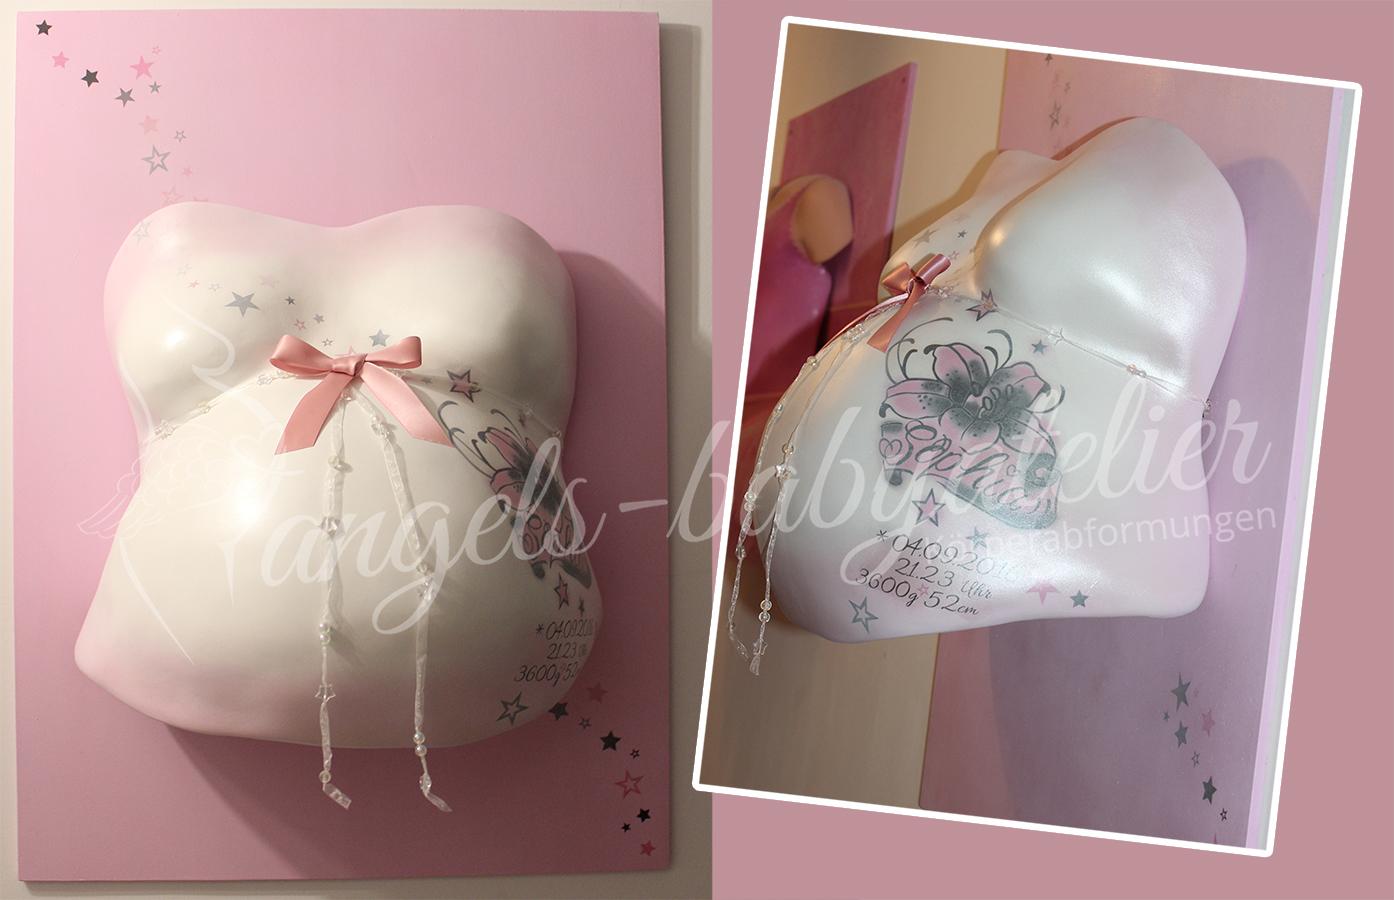 Babygipsbauchabdruck in rosa